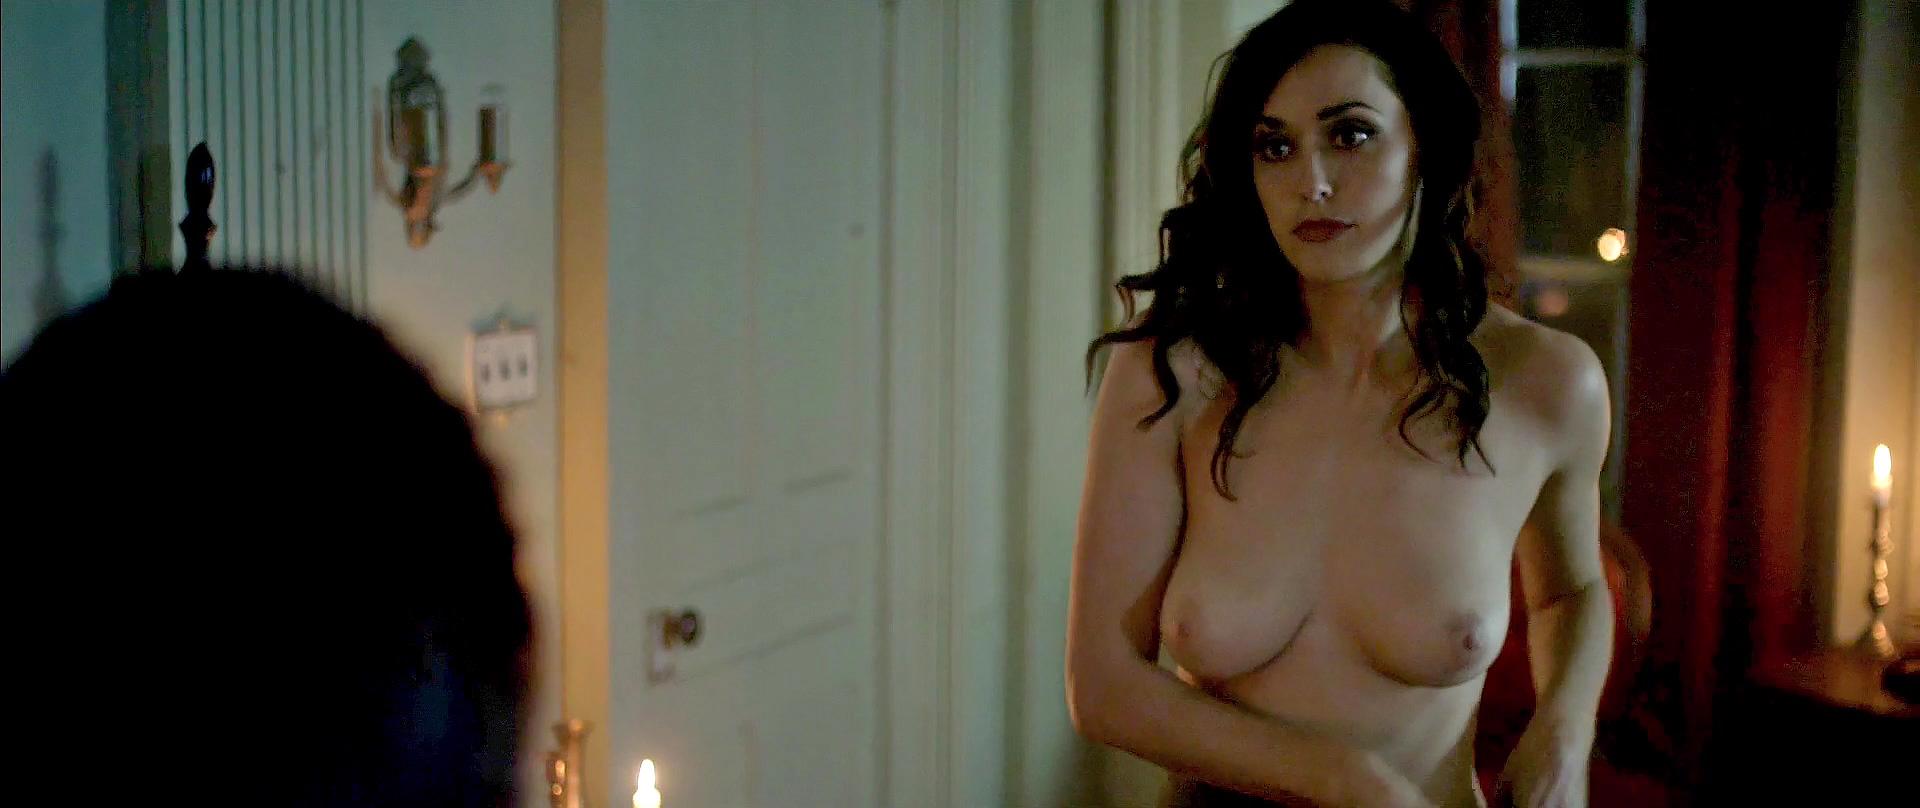 Kelly wenham nude in life on mars